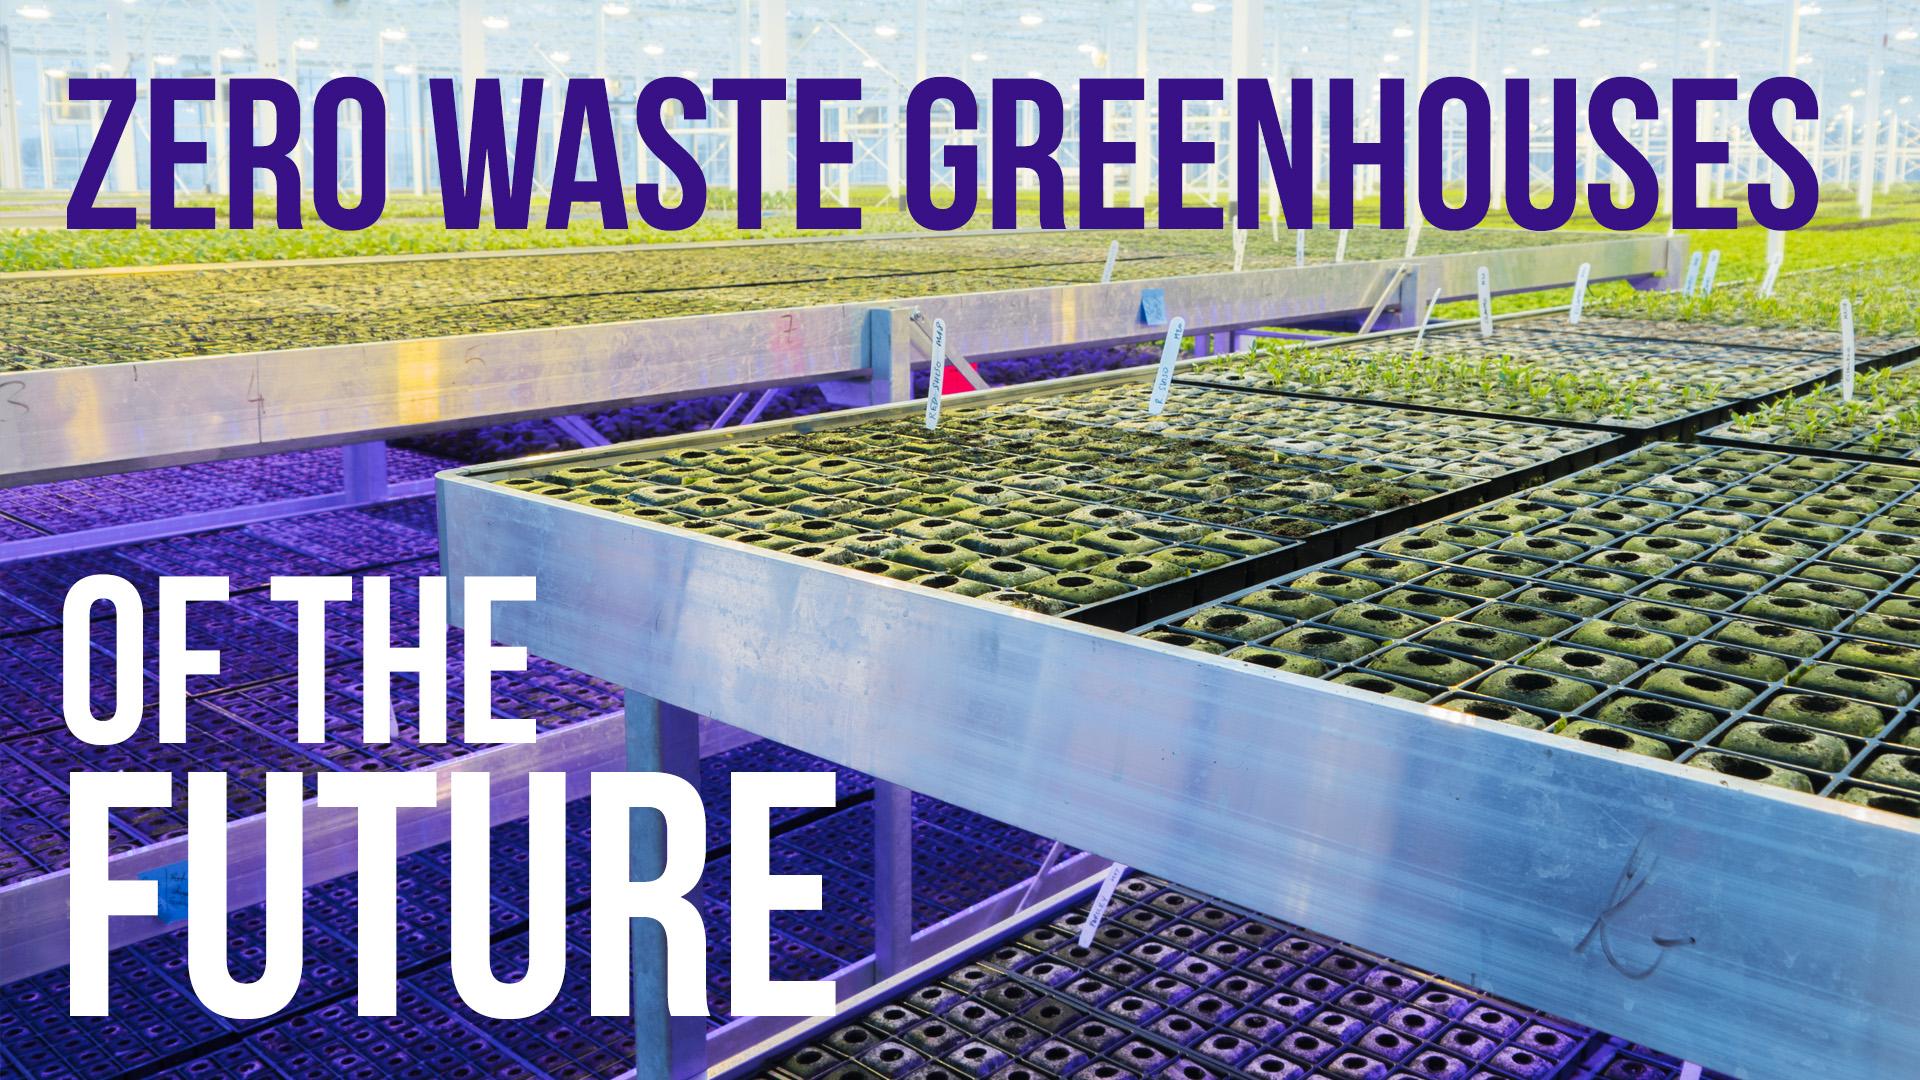 Zero Waste Greenhouses of the Future